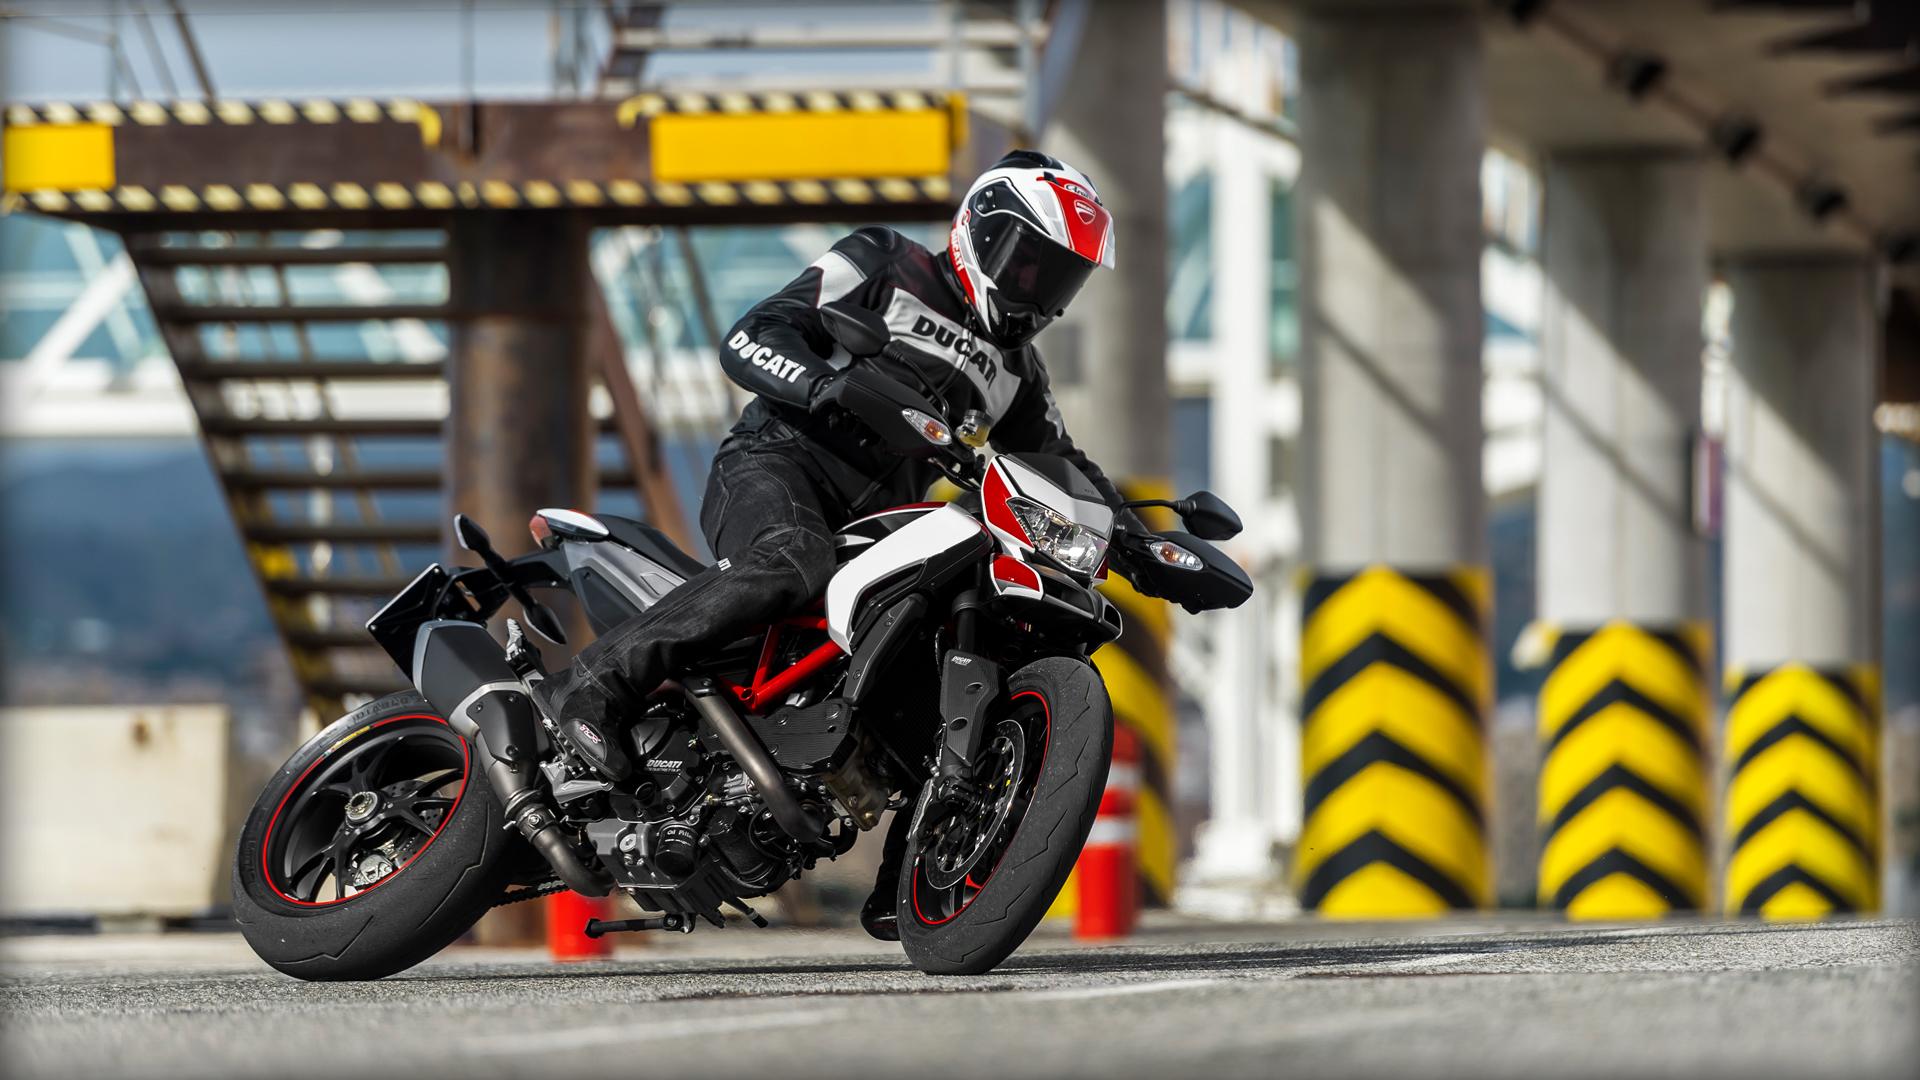 2014 Ducati HYPER MOTORARD 1100 EVO SP   Ducati Hypermotard SP